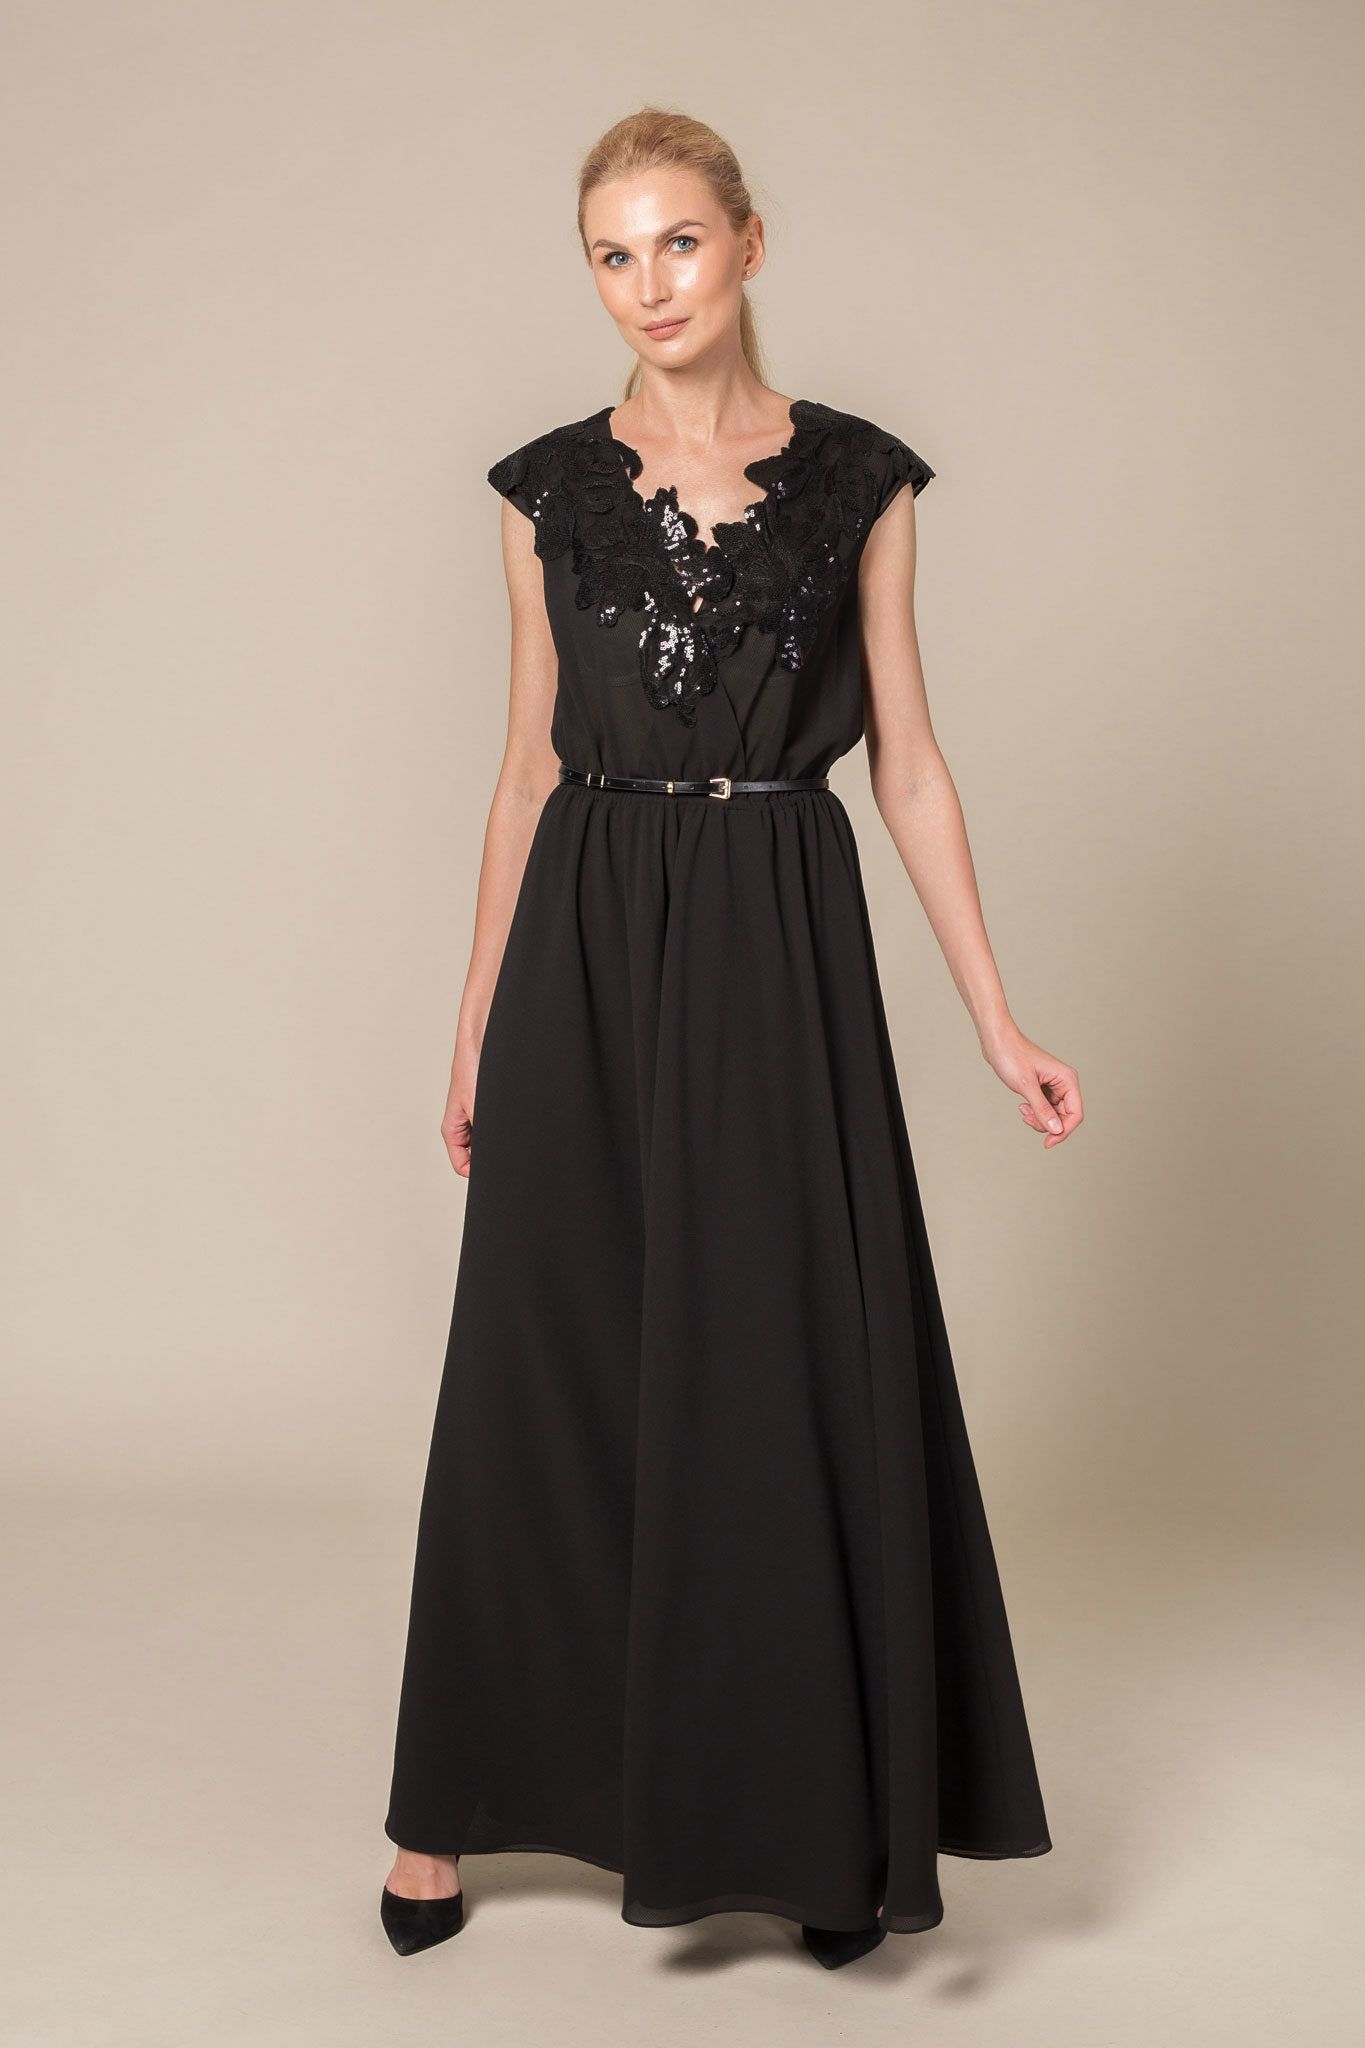 Black belted maxi dress with sequin neckline detail